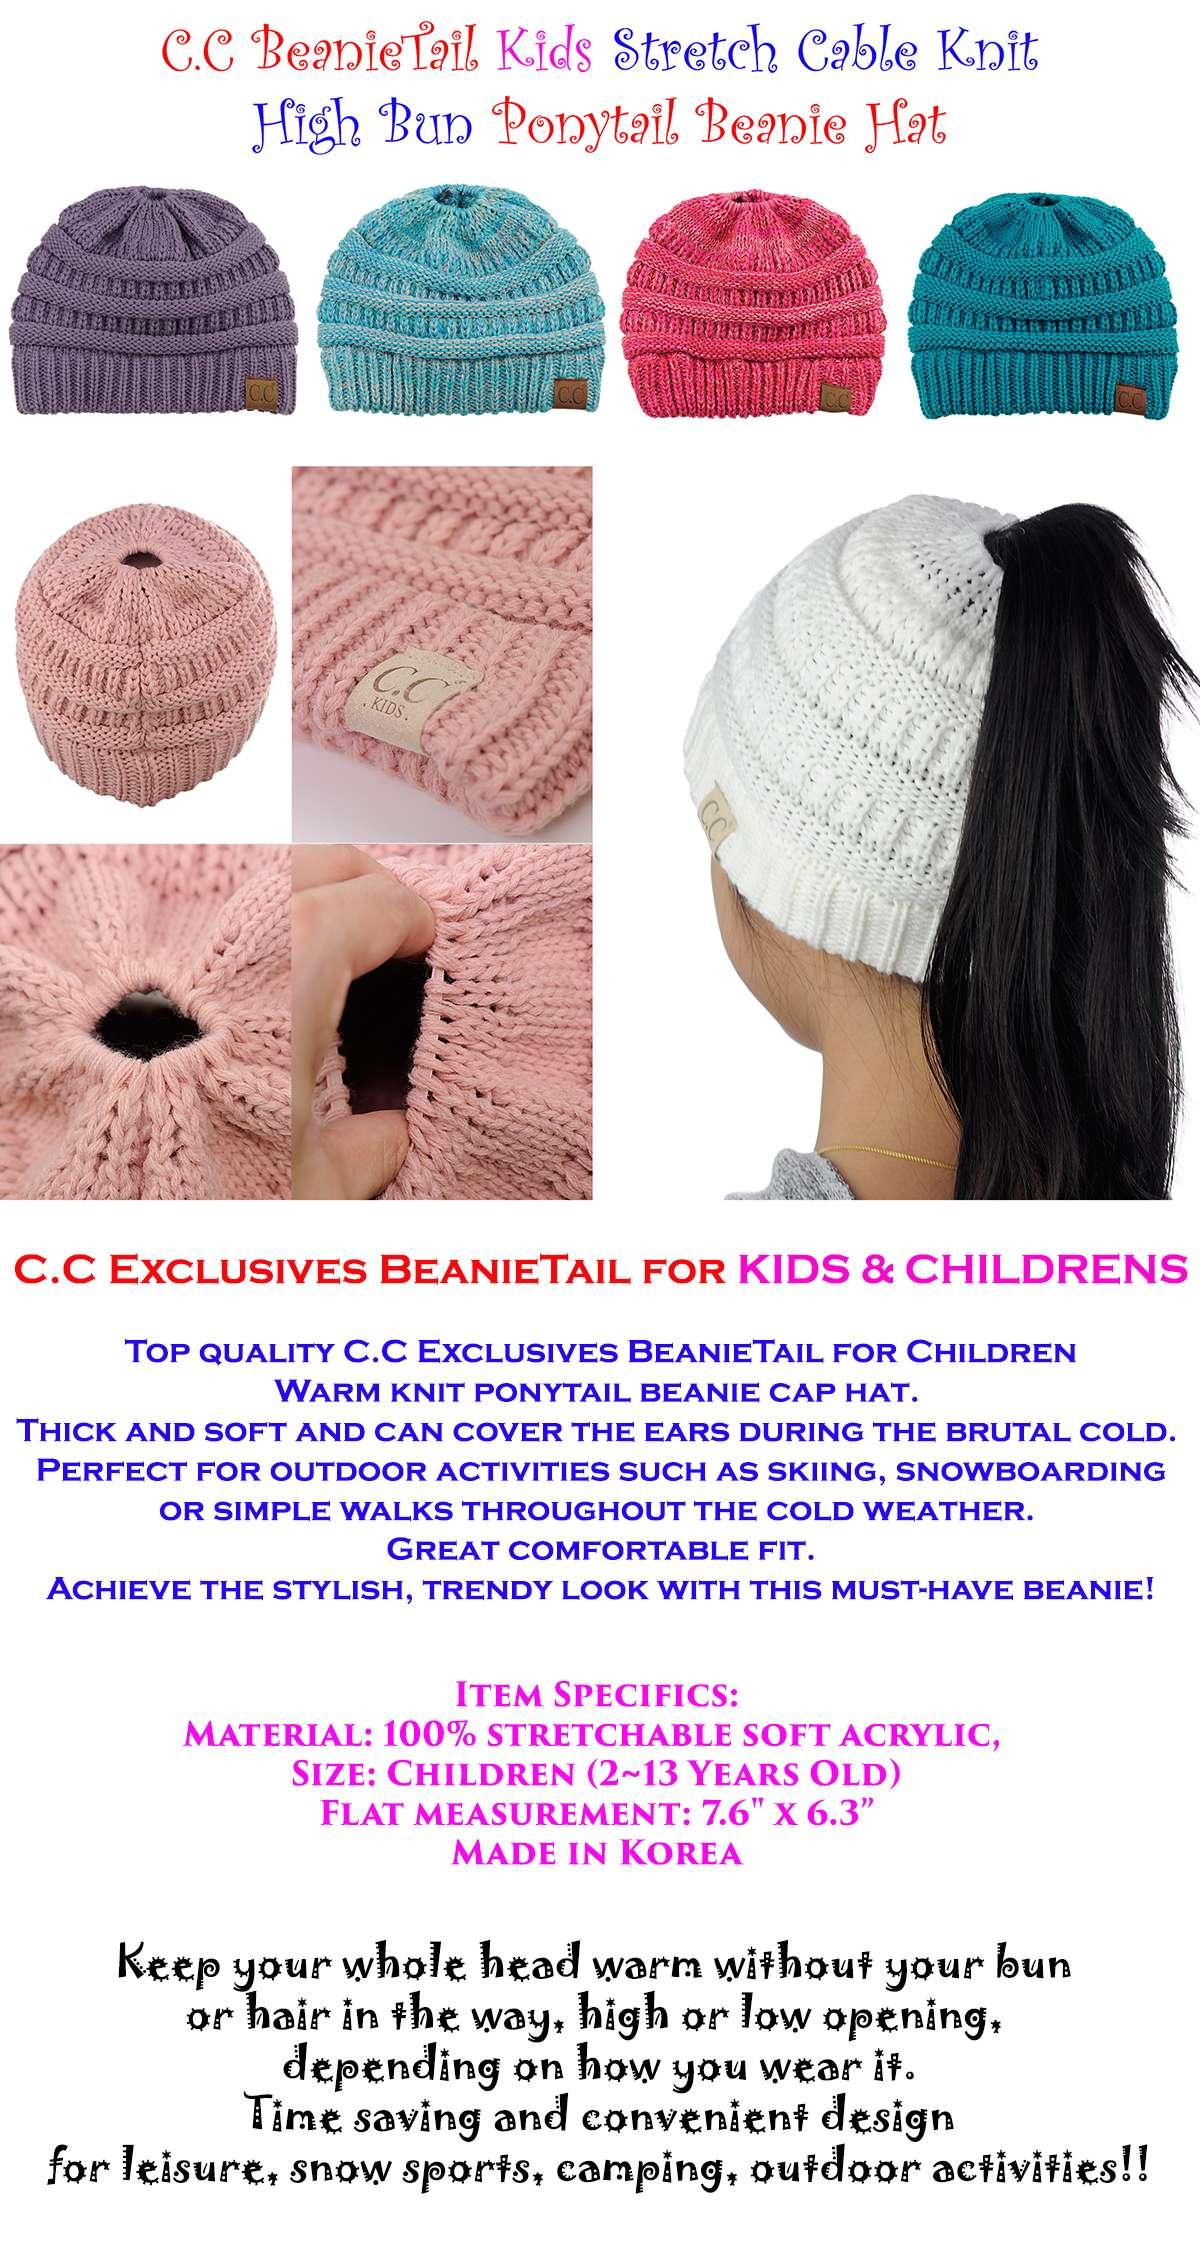 Kids CC Ponytail Beanie Children Soft Cable Knit Messy High Bun CC ... 844dff54a1d